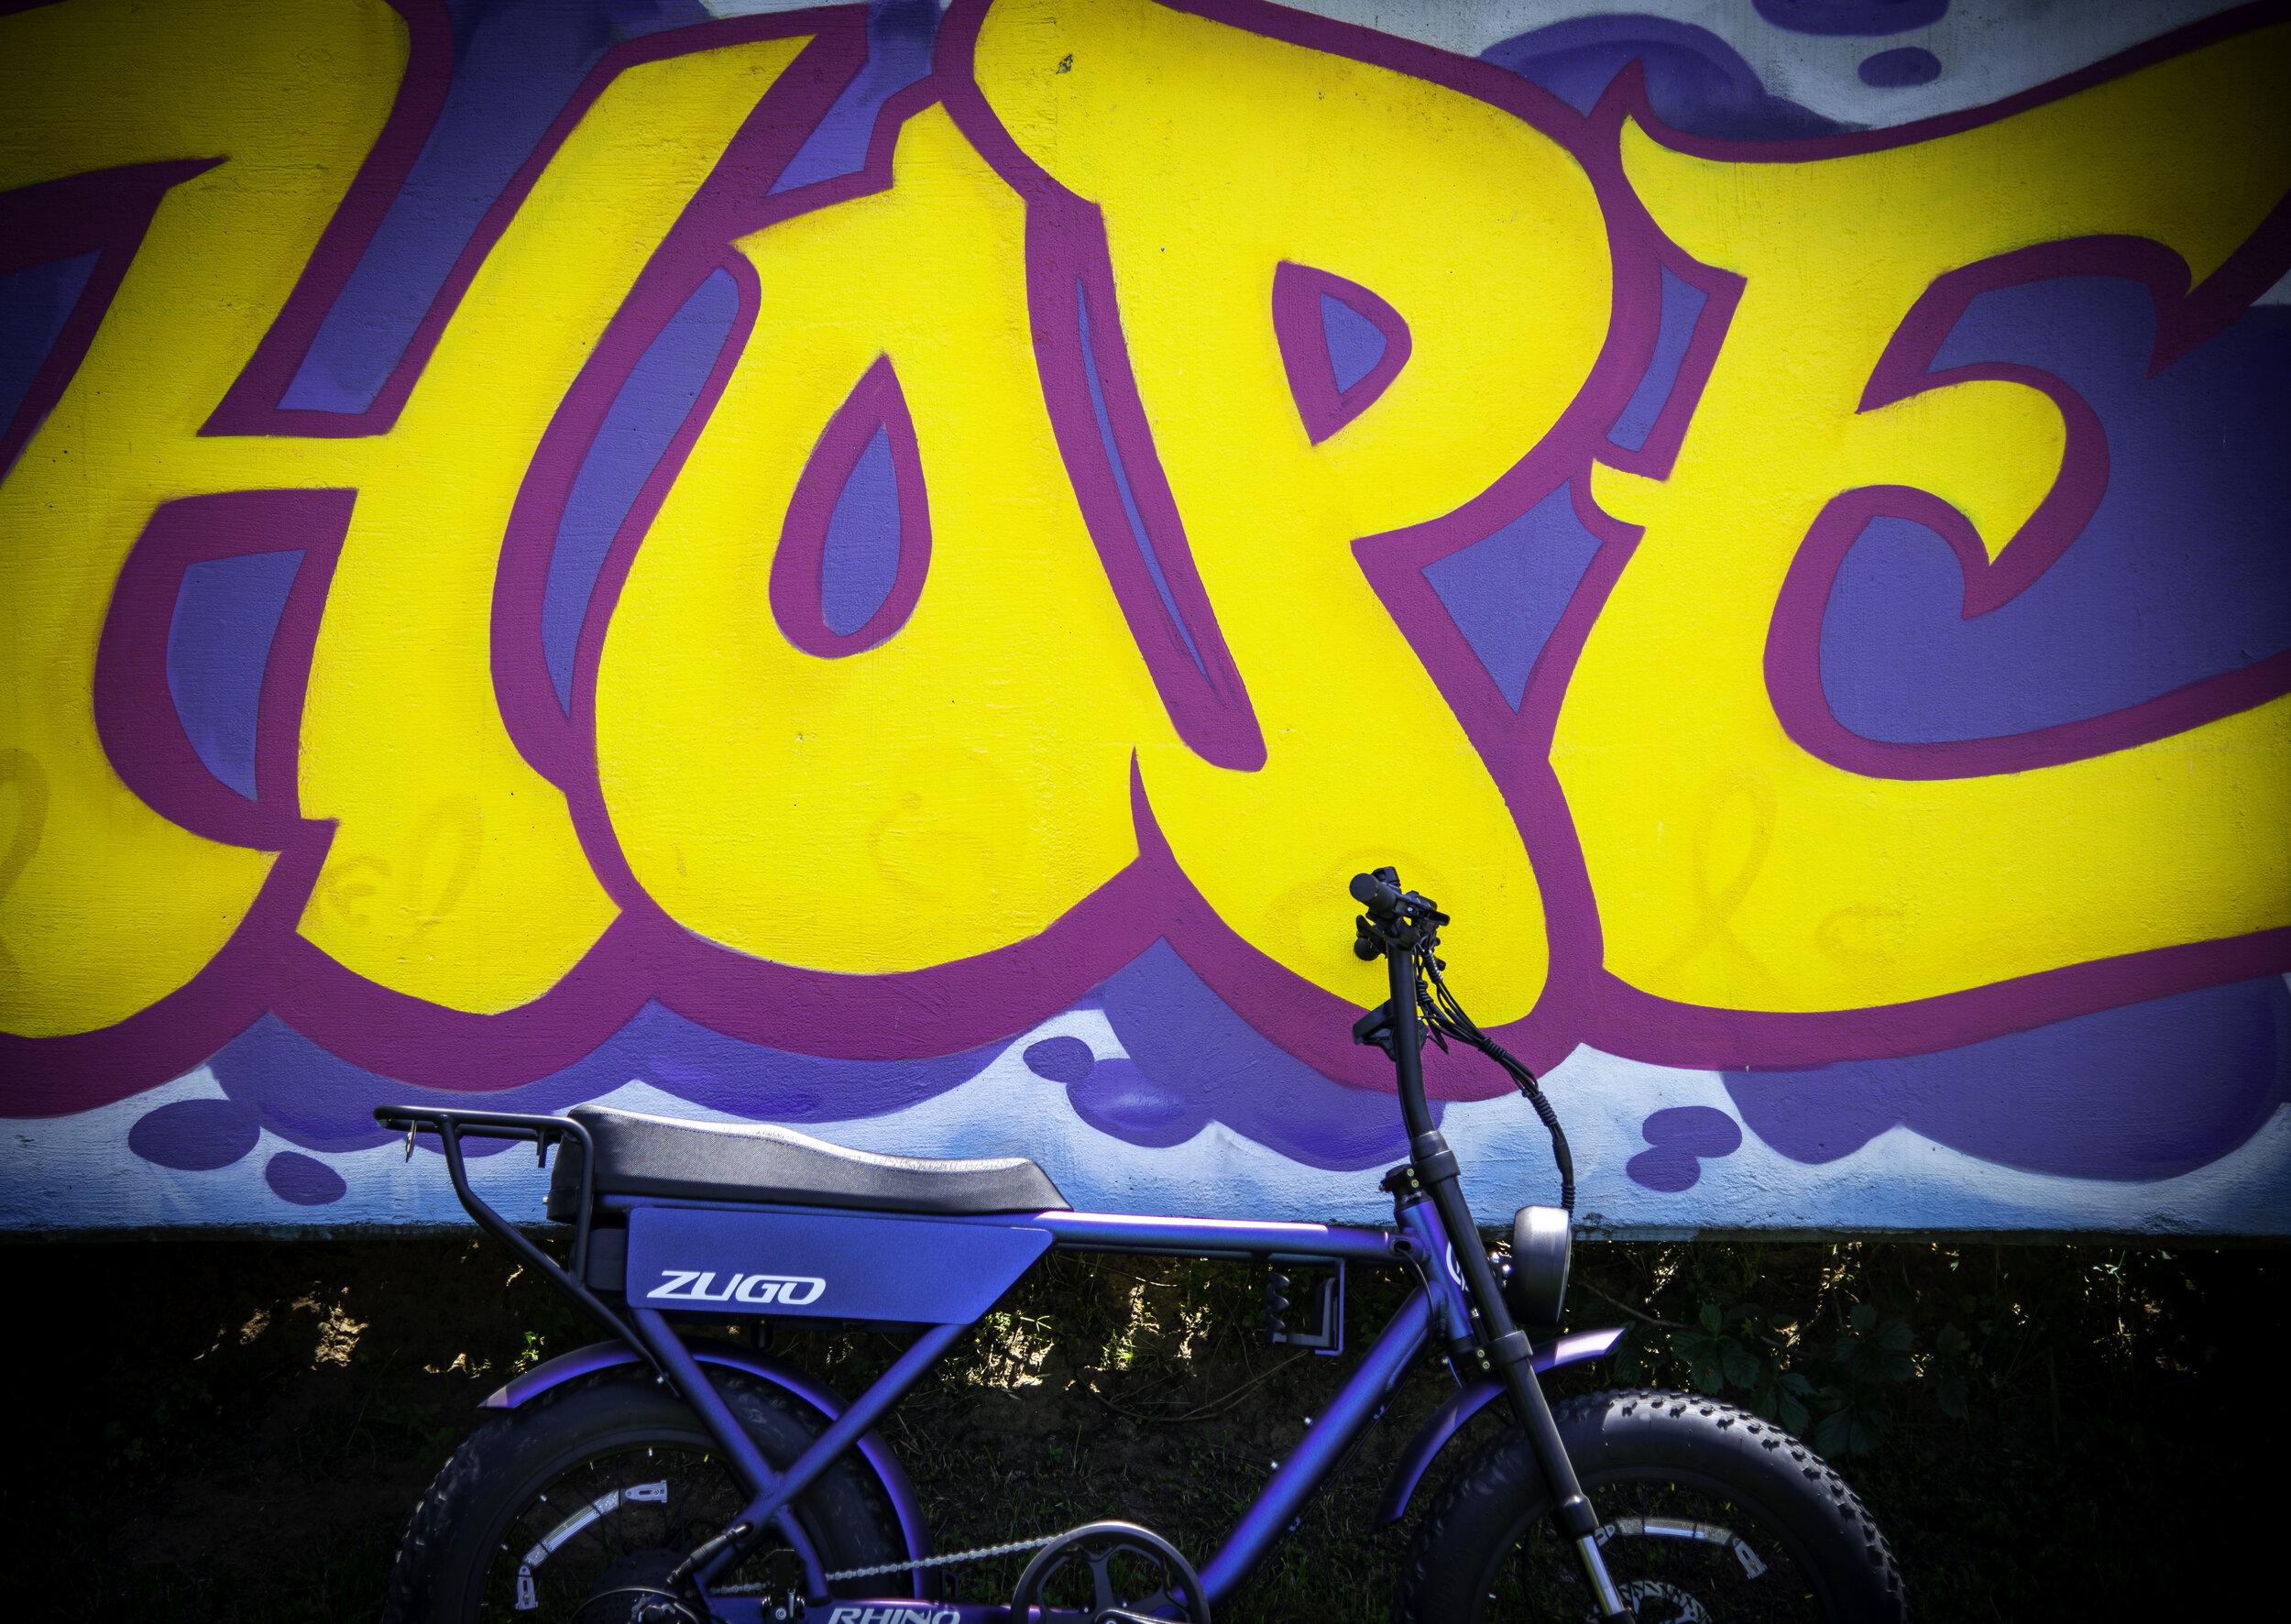 Zugo Bikes Elevate The Media